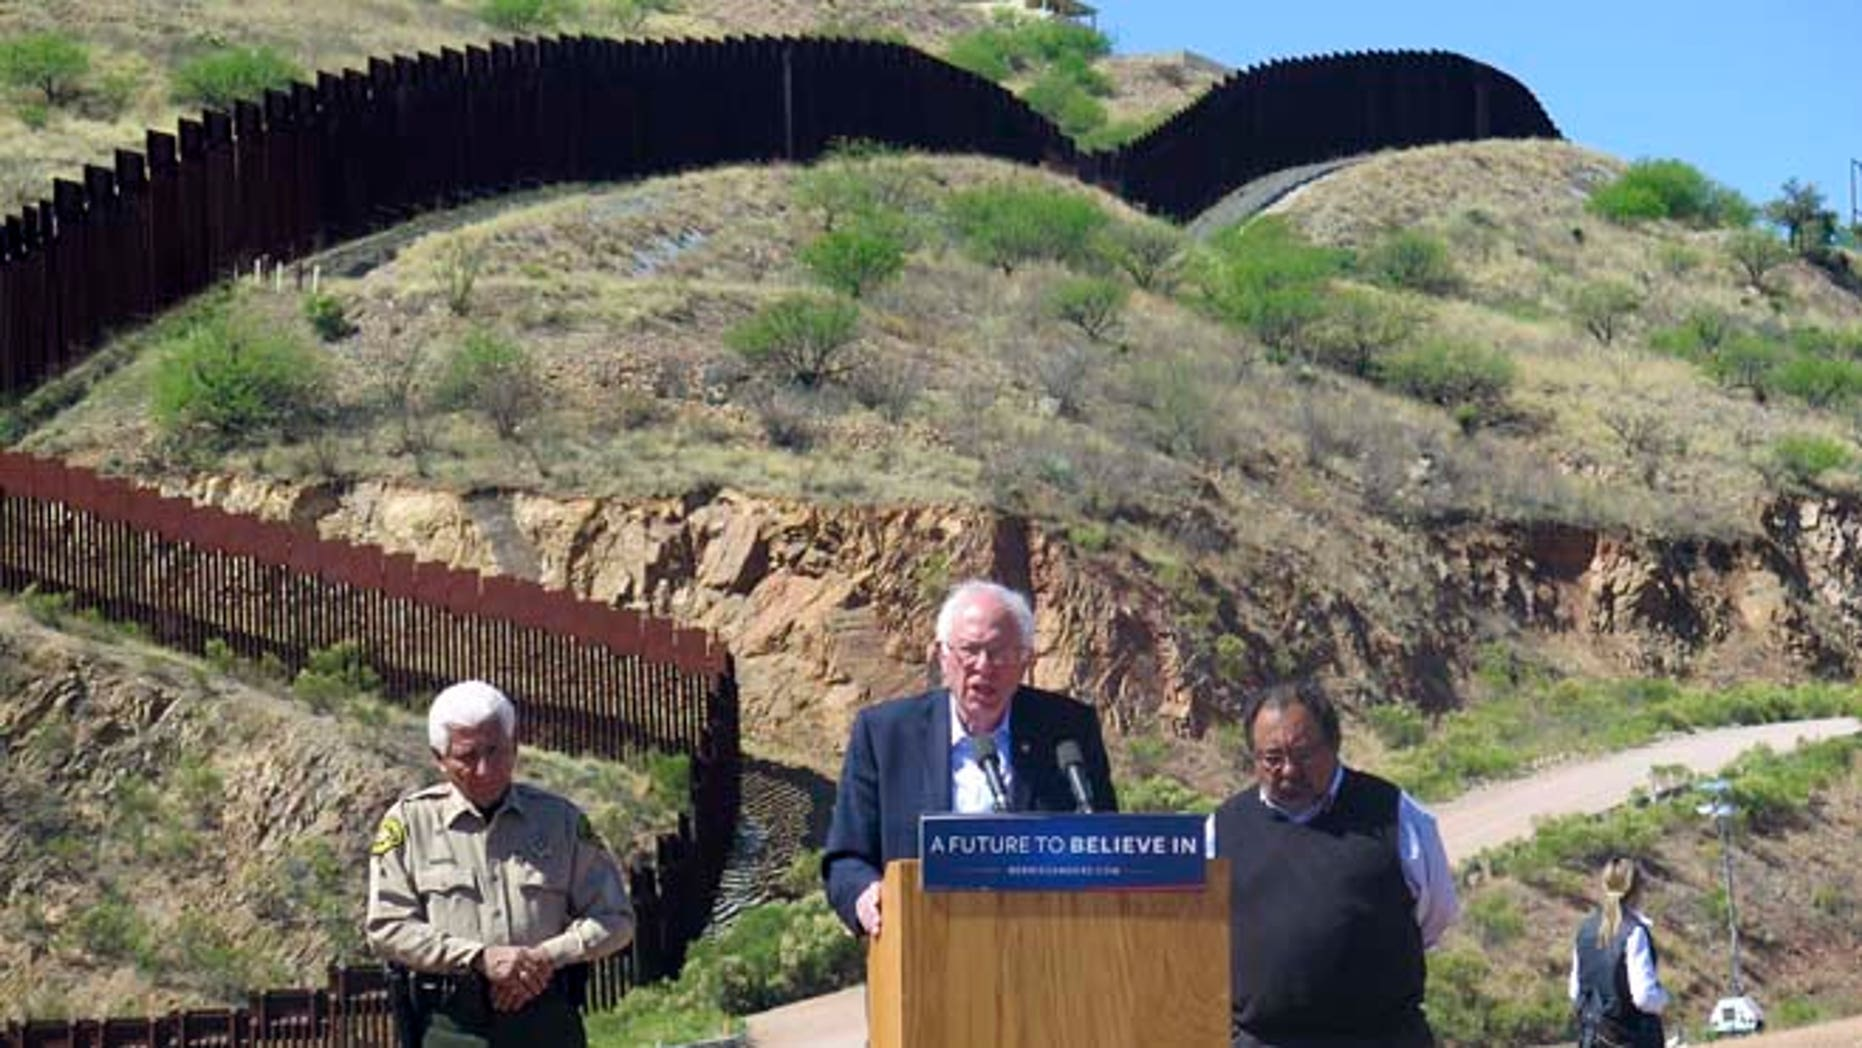 Bernie Sanders near the U.S.-Mexico international border in Nogales, Ariz., Saturday, March 19, 2016.